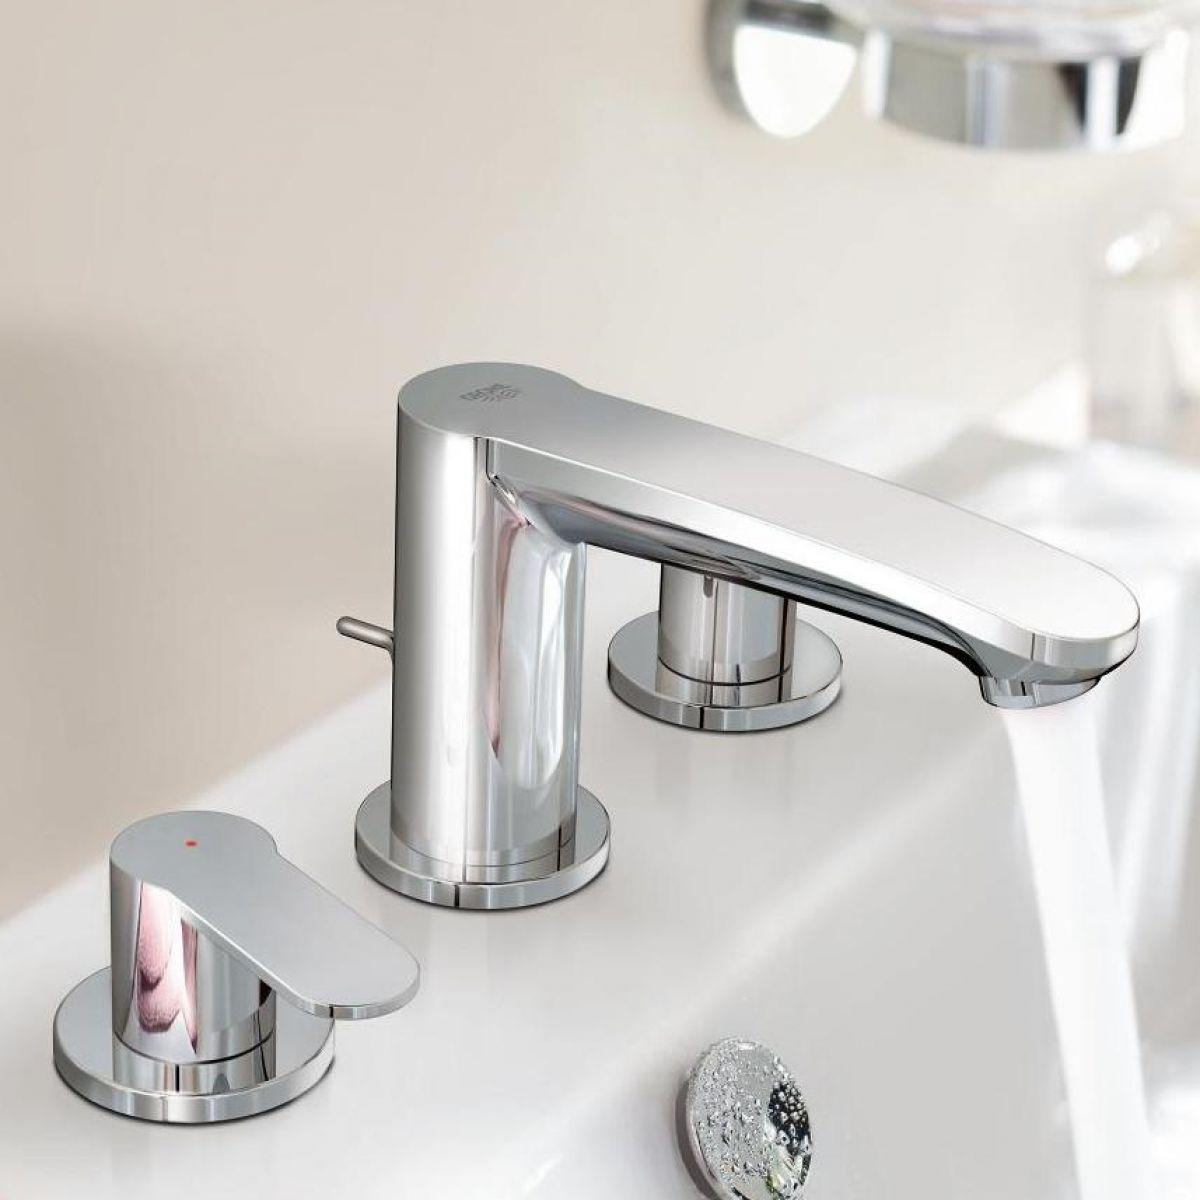 Grohe Eurostyle Cosmopolitan 3 Hole Basin Mixer Tap S Size Uk